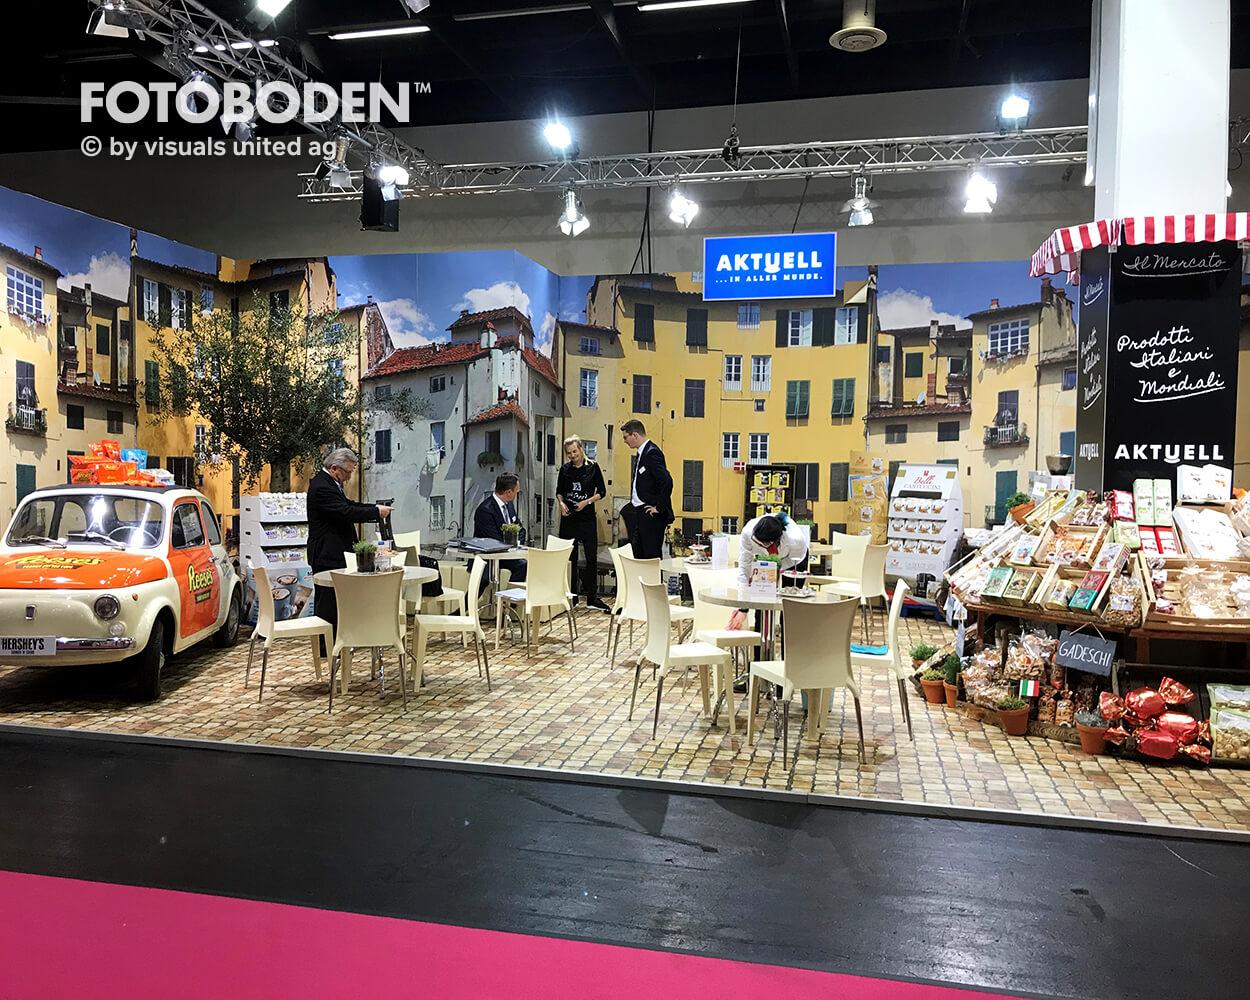 FOTOBODEN™ Messeboden Bodengestaltung Objektdesign